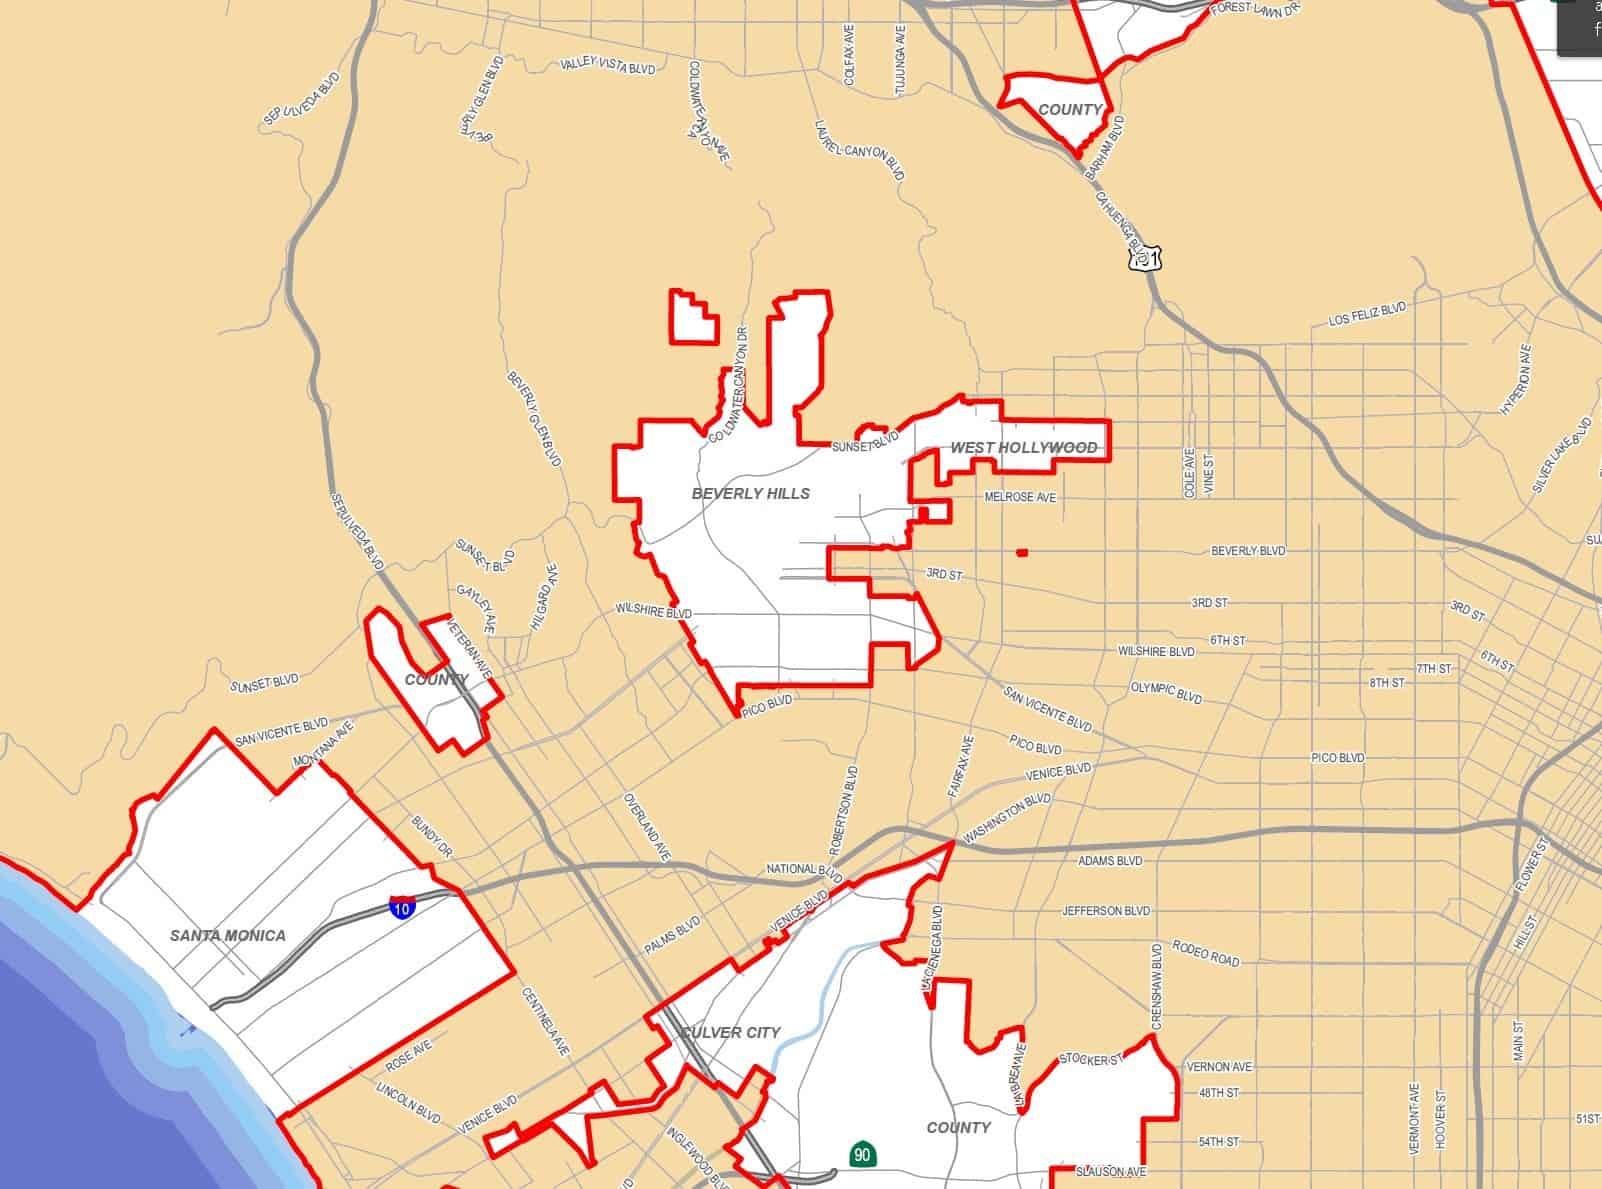 Rent Control Los Angeles Map